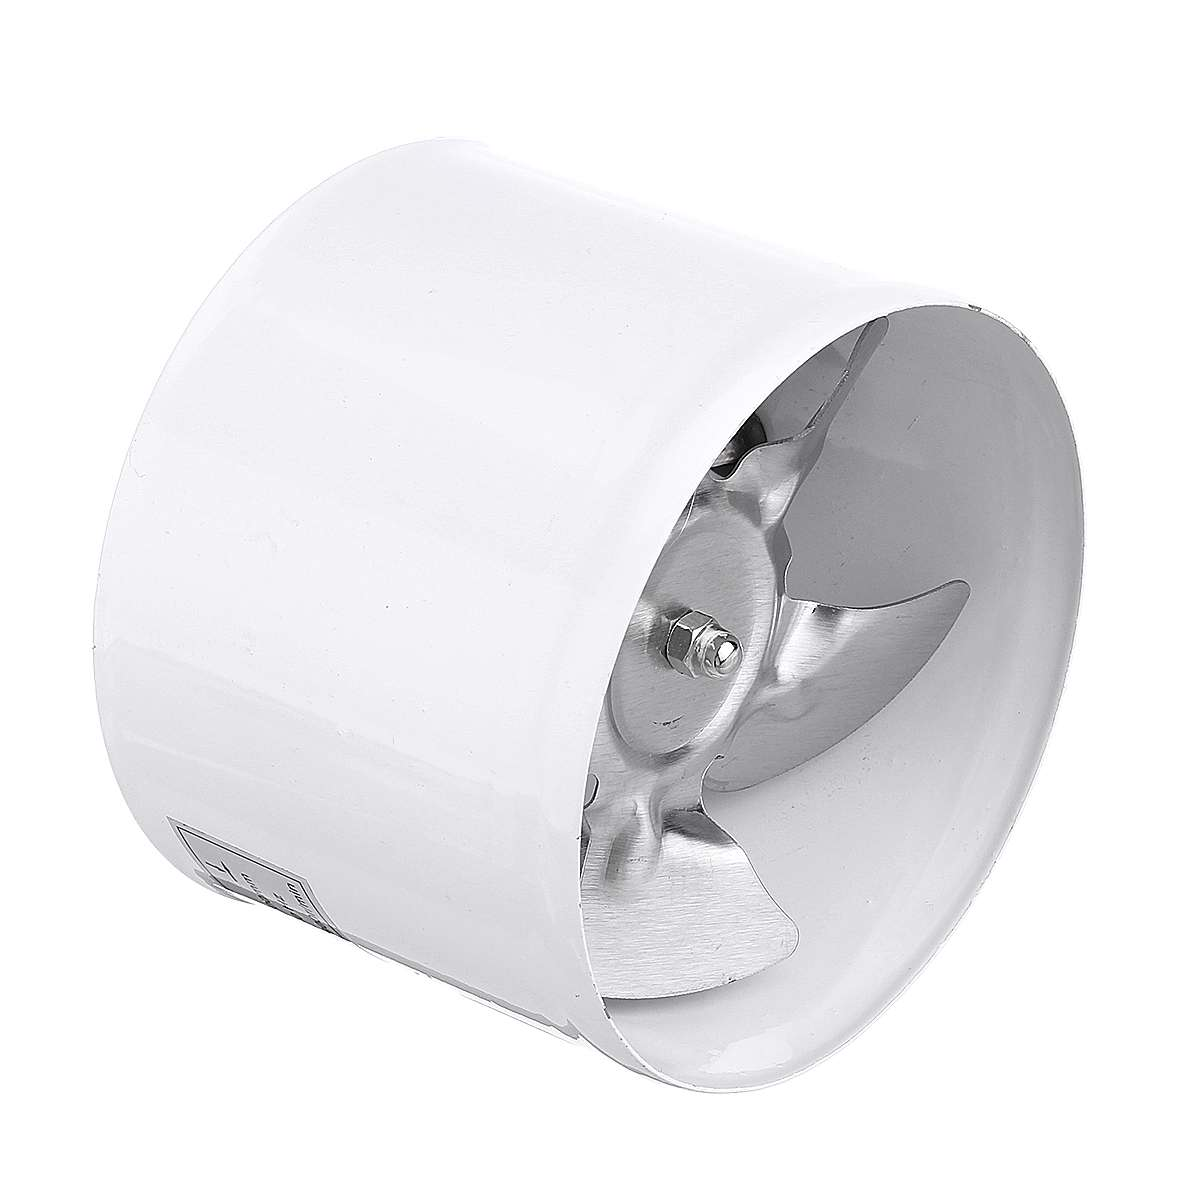 4 Inch Round Duct Fan Wall Toilets Window Exhaust Fan Ventilation Quiet Industrial Kitchen Exhaust Ventilate Air Vent Fan 100mm